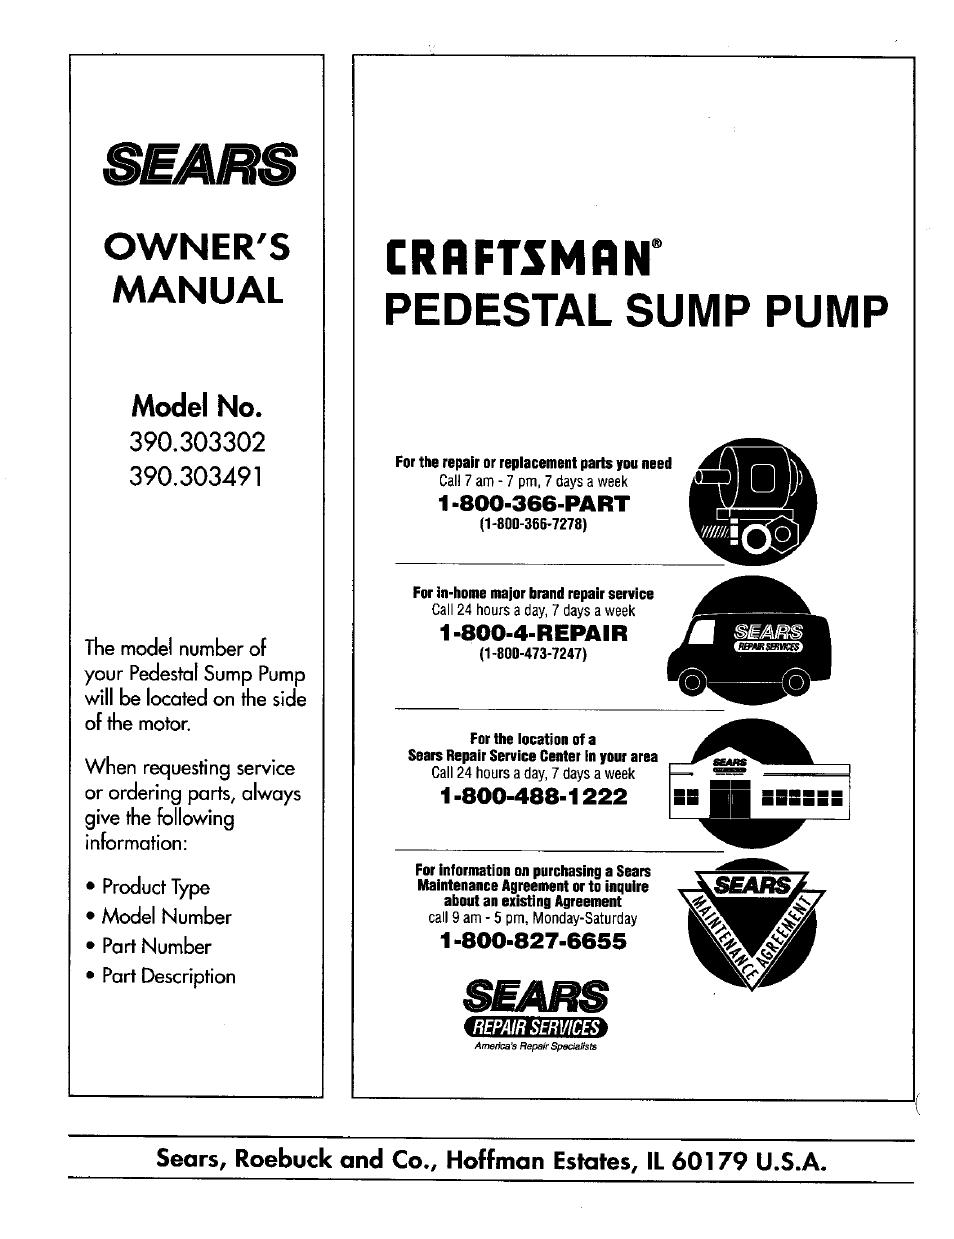 Owners manual pedestal sump pump sears 390303491 user manual owners manual pedestal sump pump sears 390303491 user manual page 8 8 platinumwayz